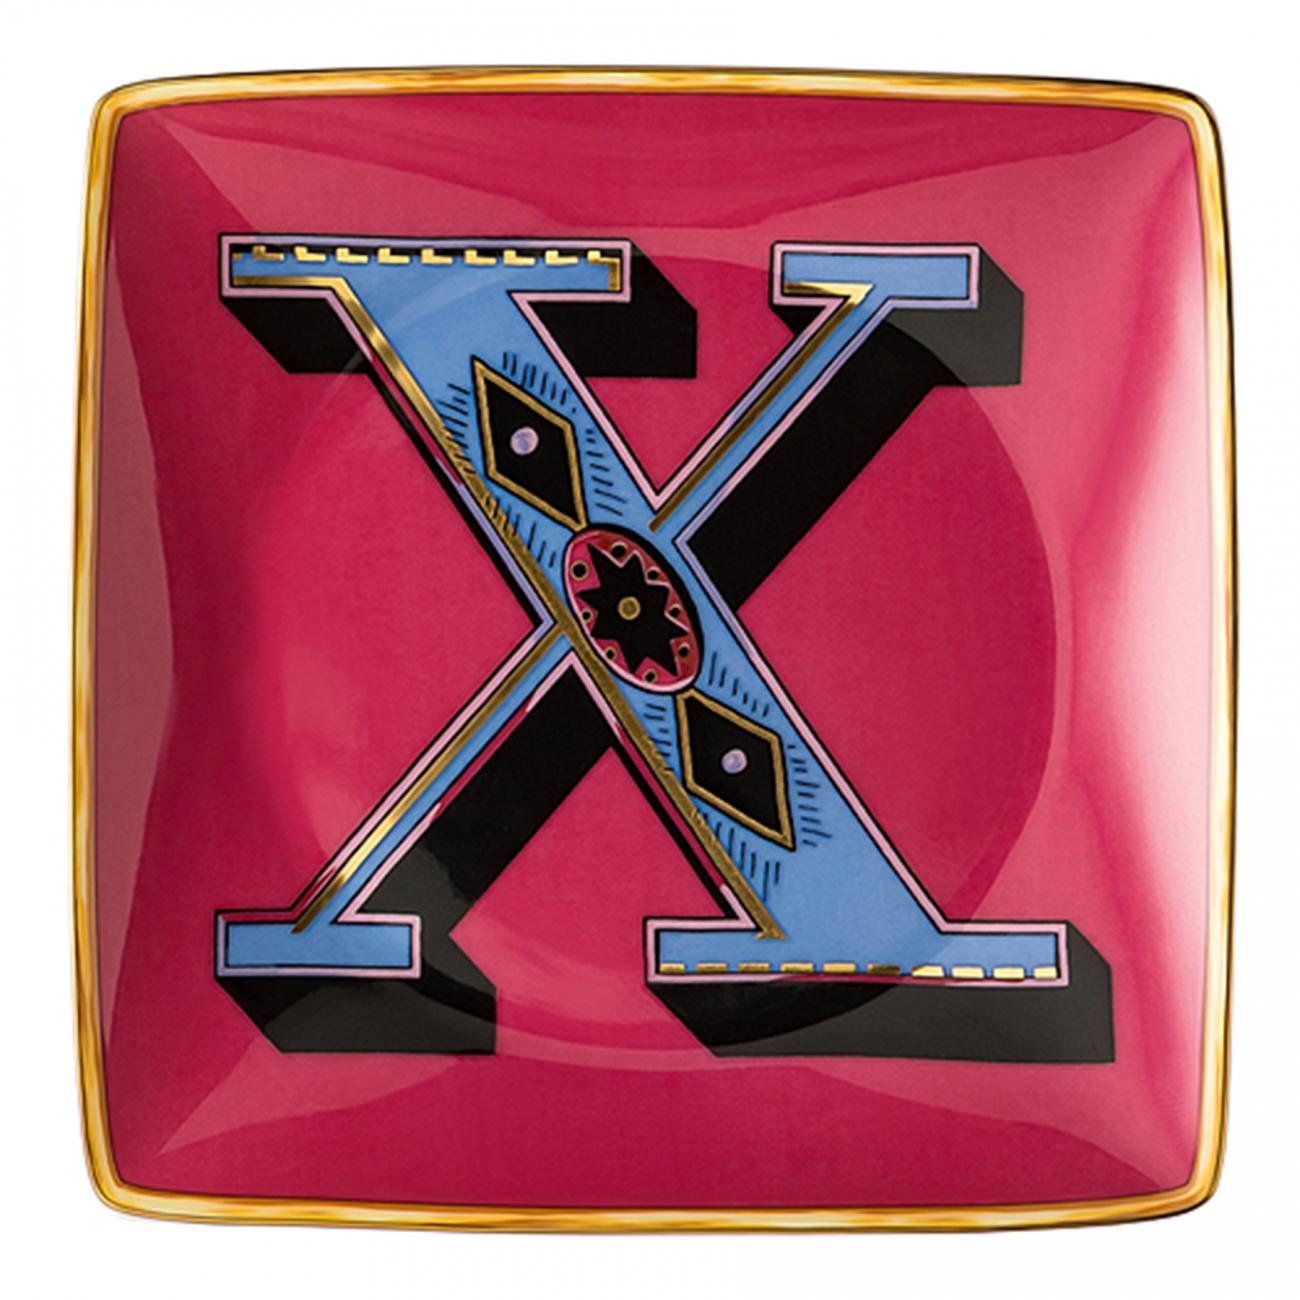 Rosenthal Versace Alphabet X Coppetta quadra piana